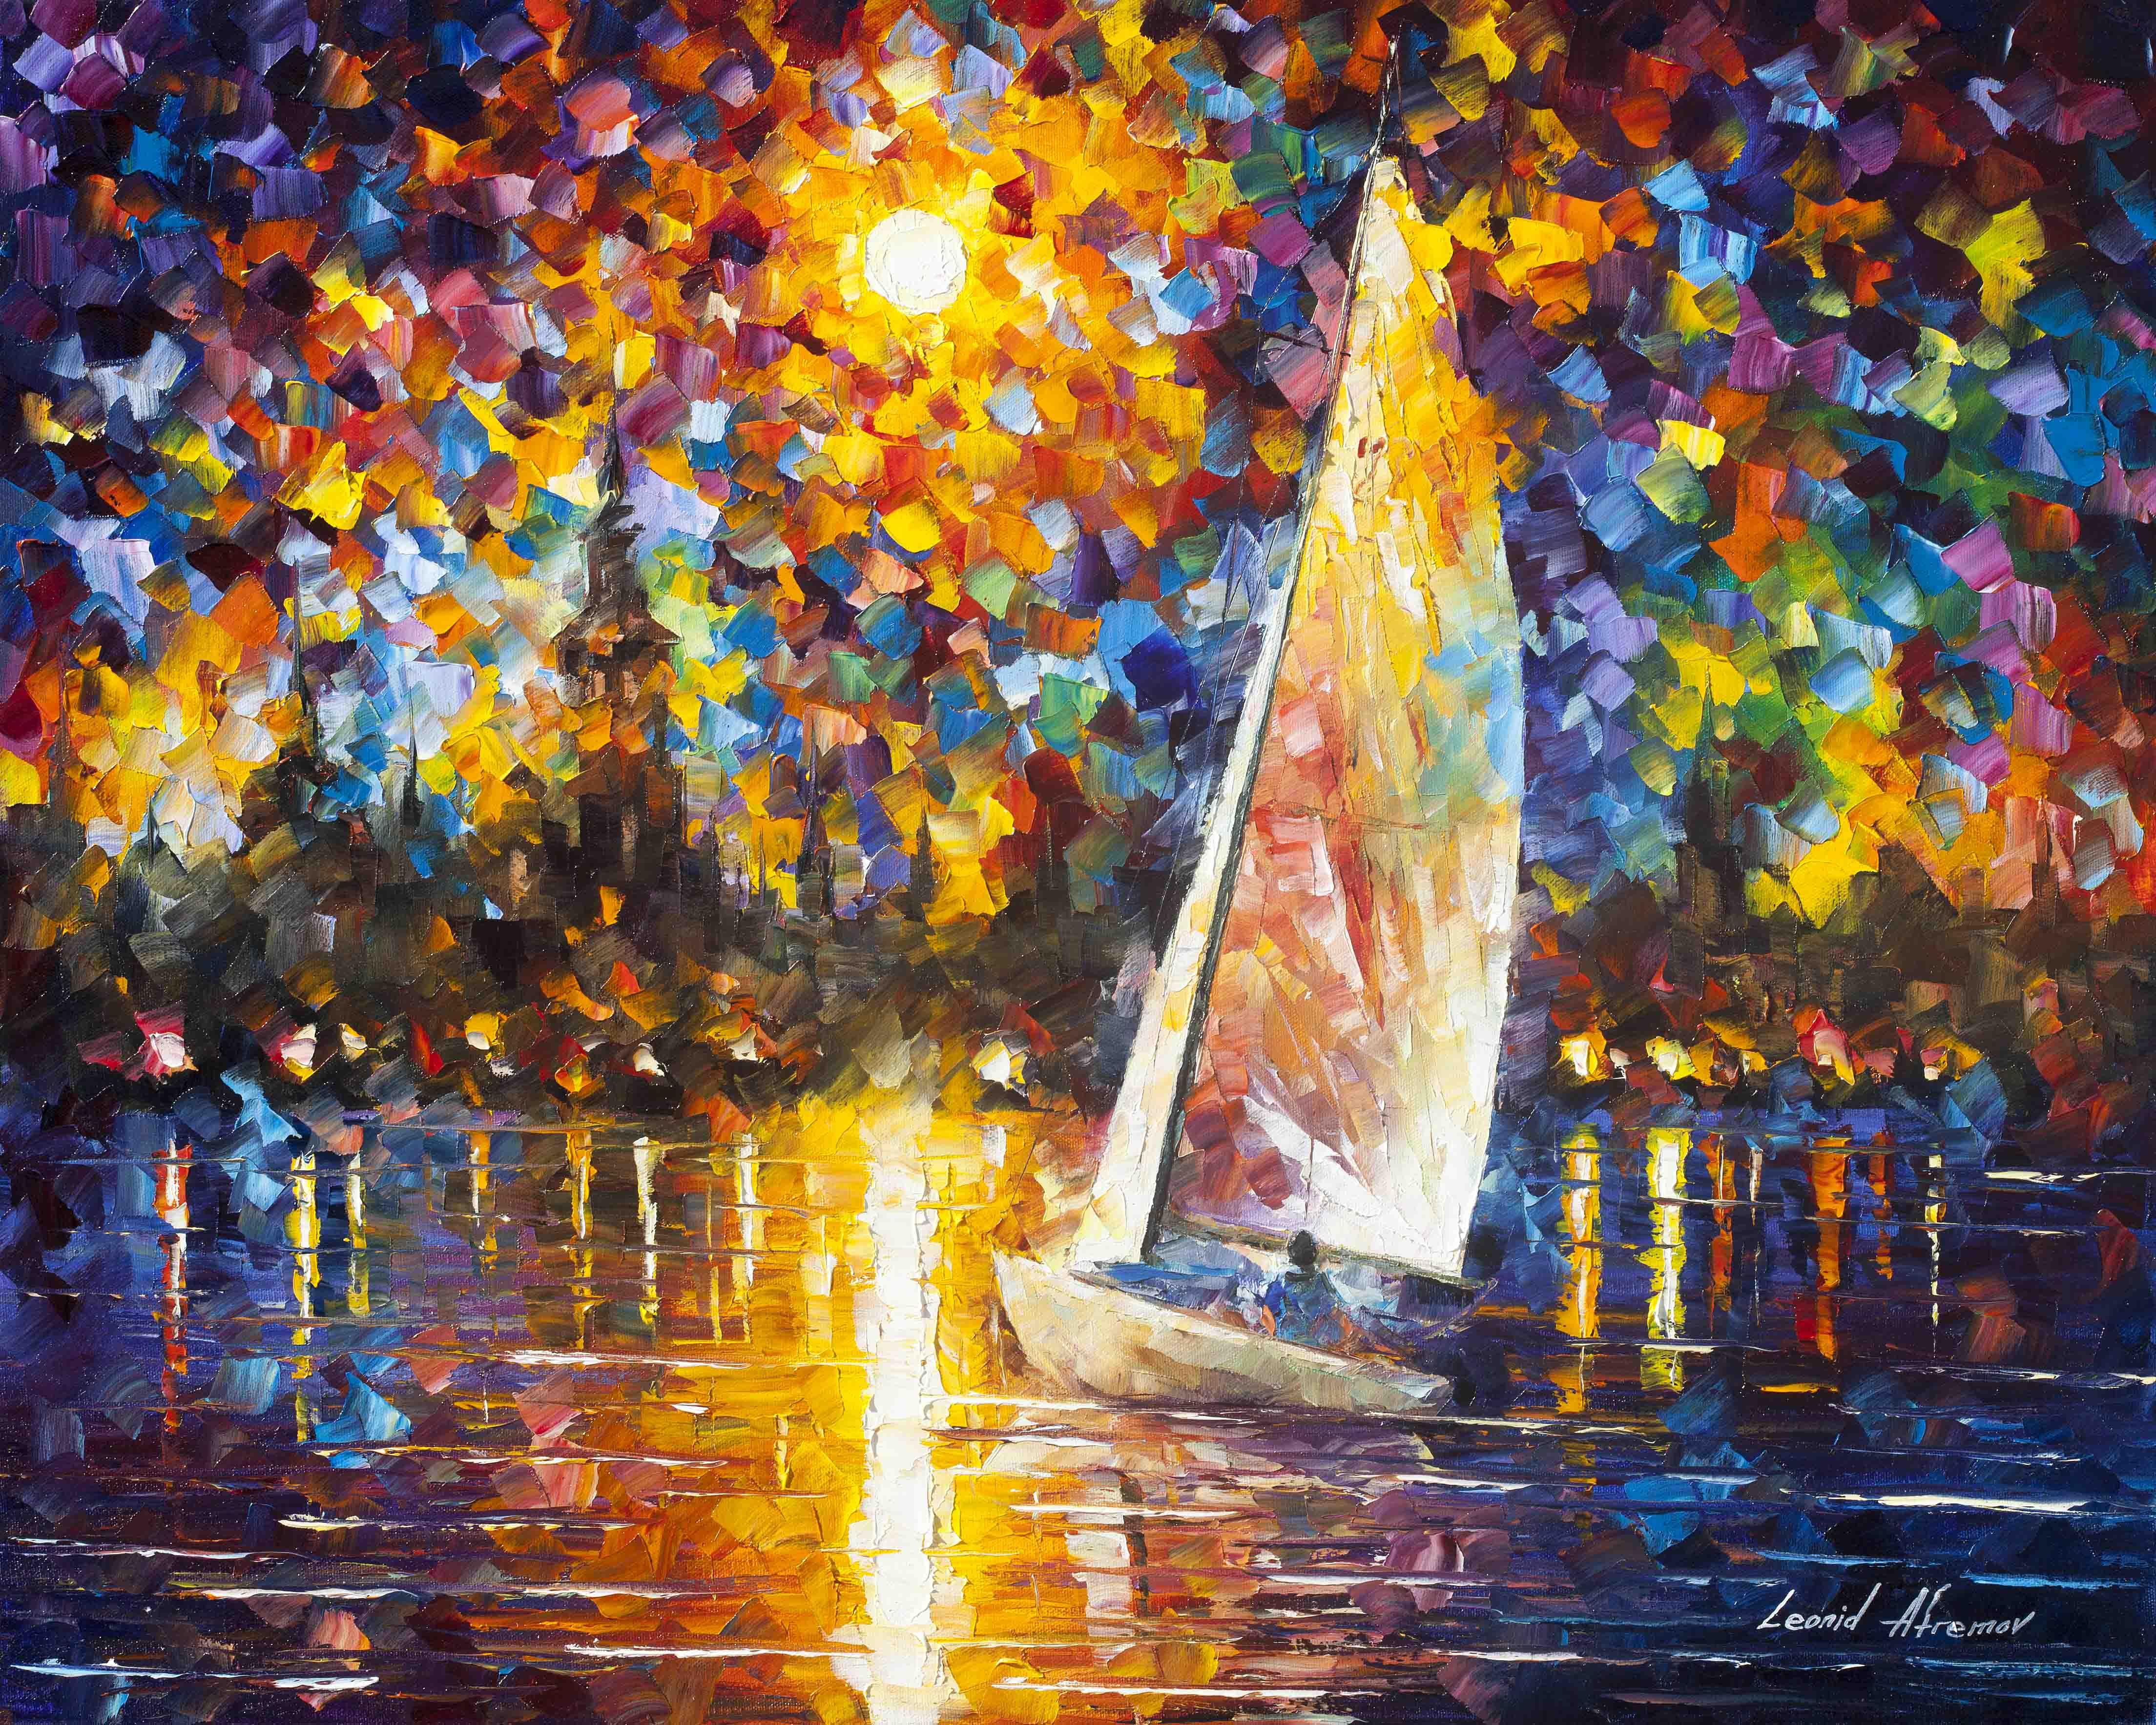 Sailing to the shore – Leonid Afremov